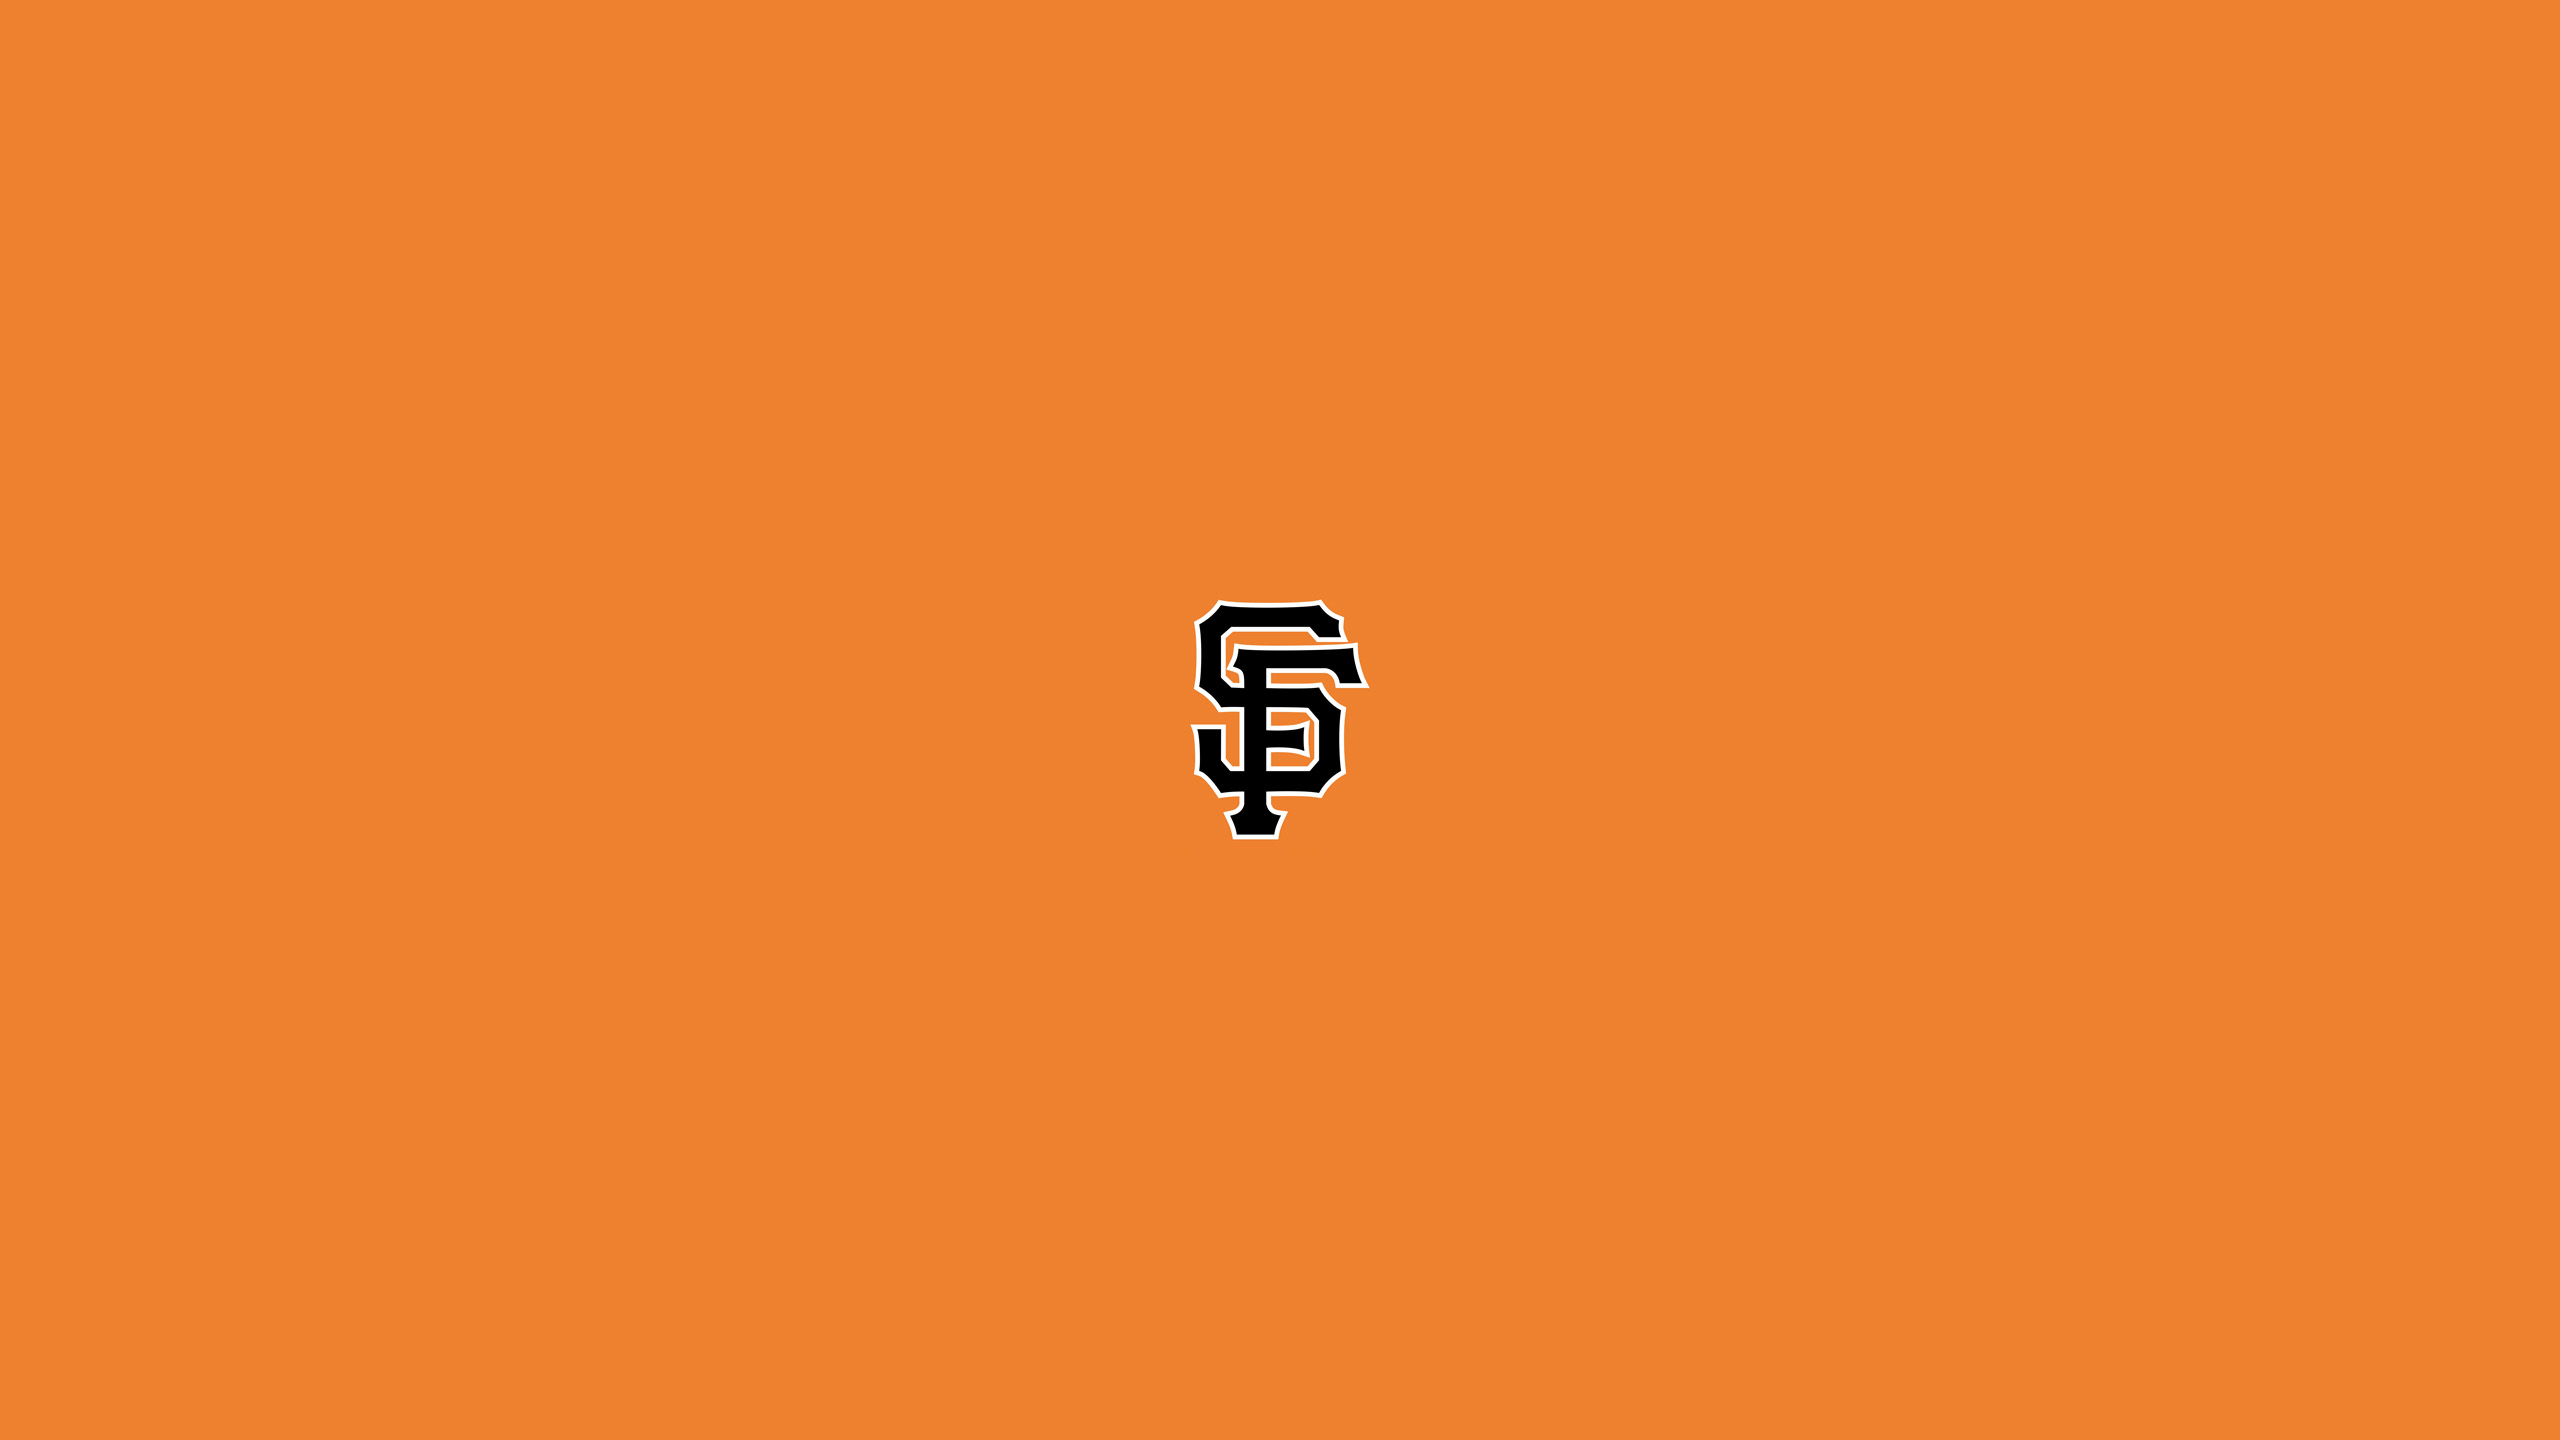 san francisco giants minimalist logo hd wallpapers